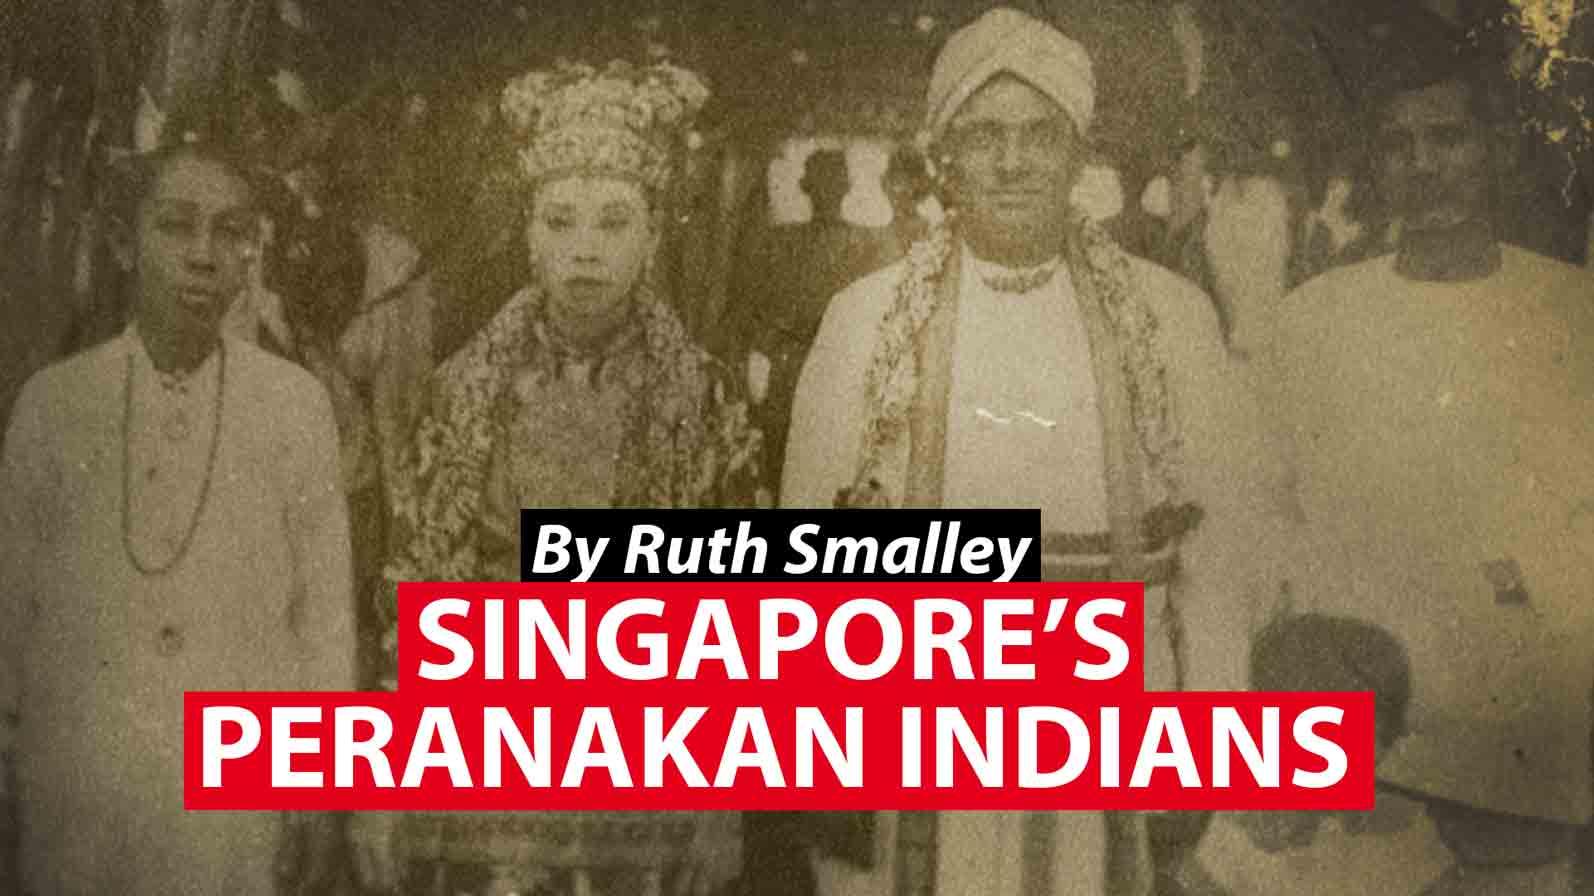 Singapore's Peranakan Indians